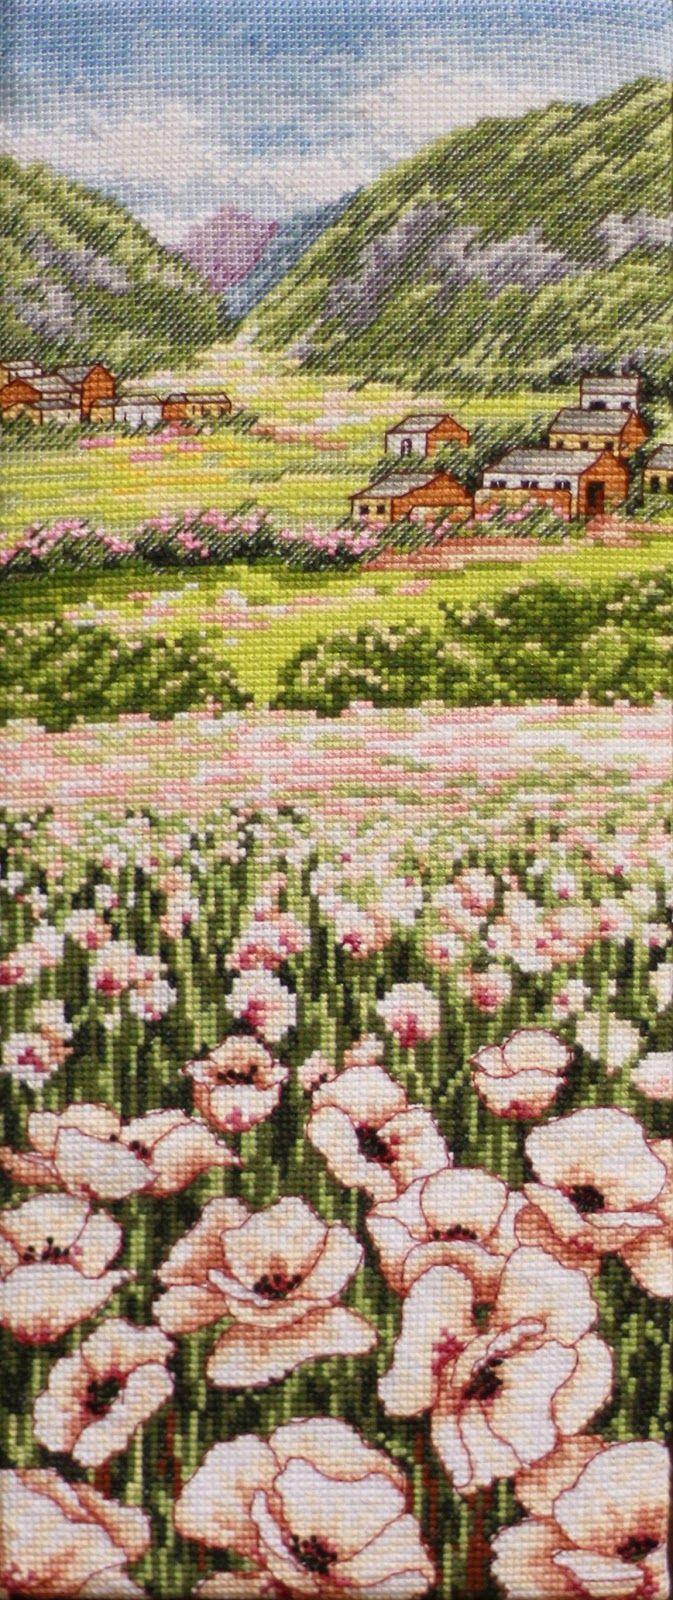 http://bellalaura555.blogspot.com/search/label/Lavender